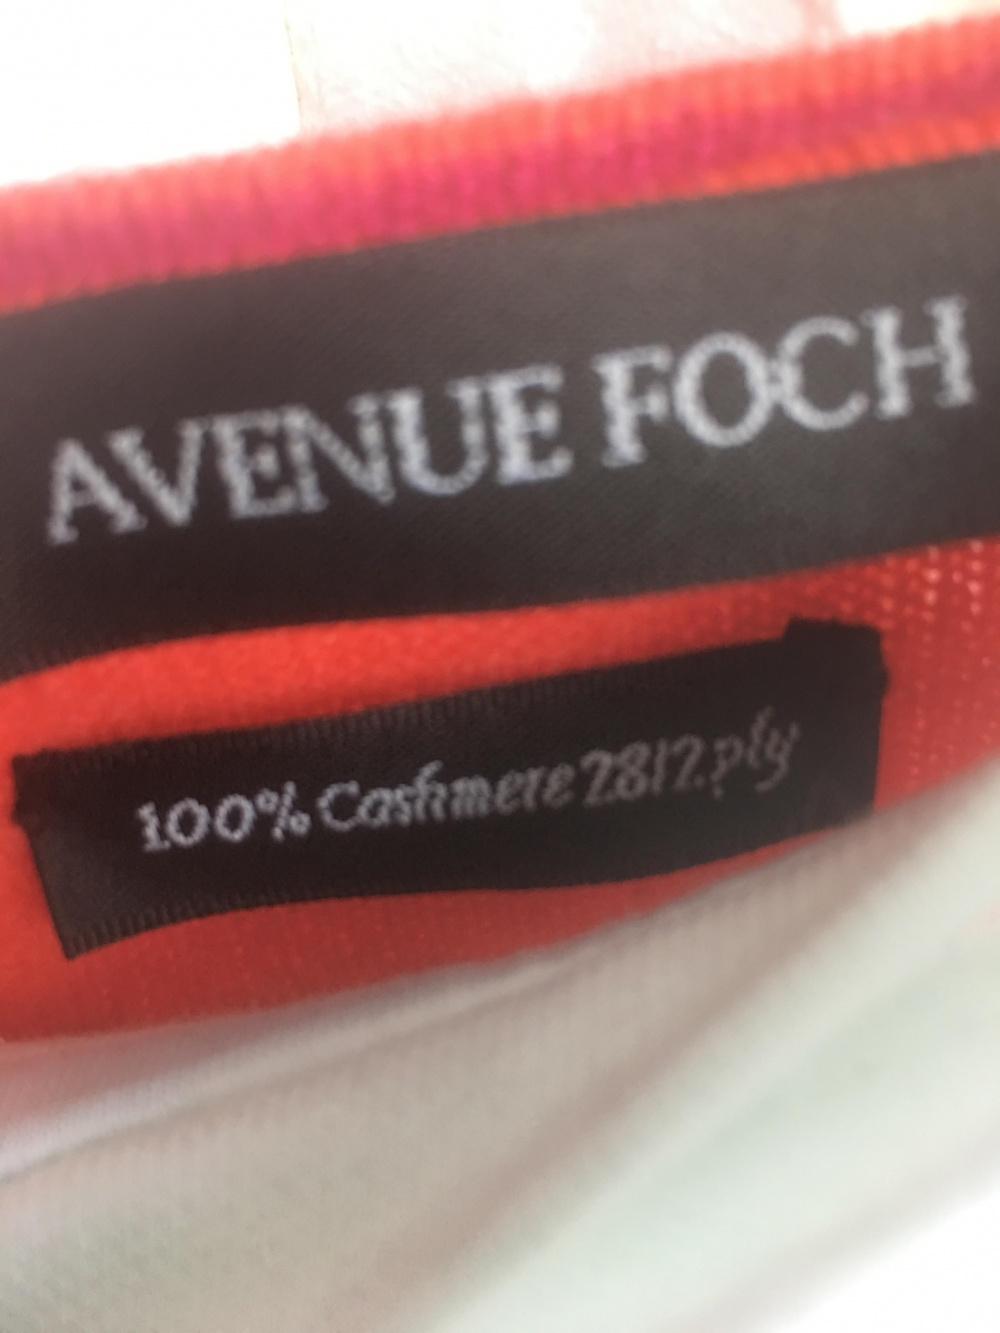 Кардиган Avenue Foch. Размер: L.